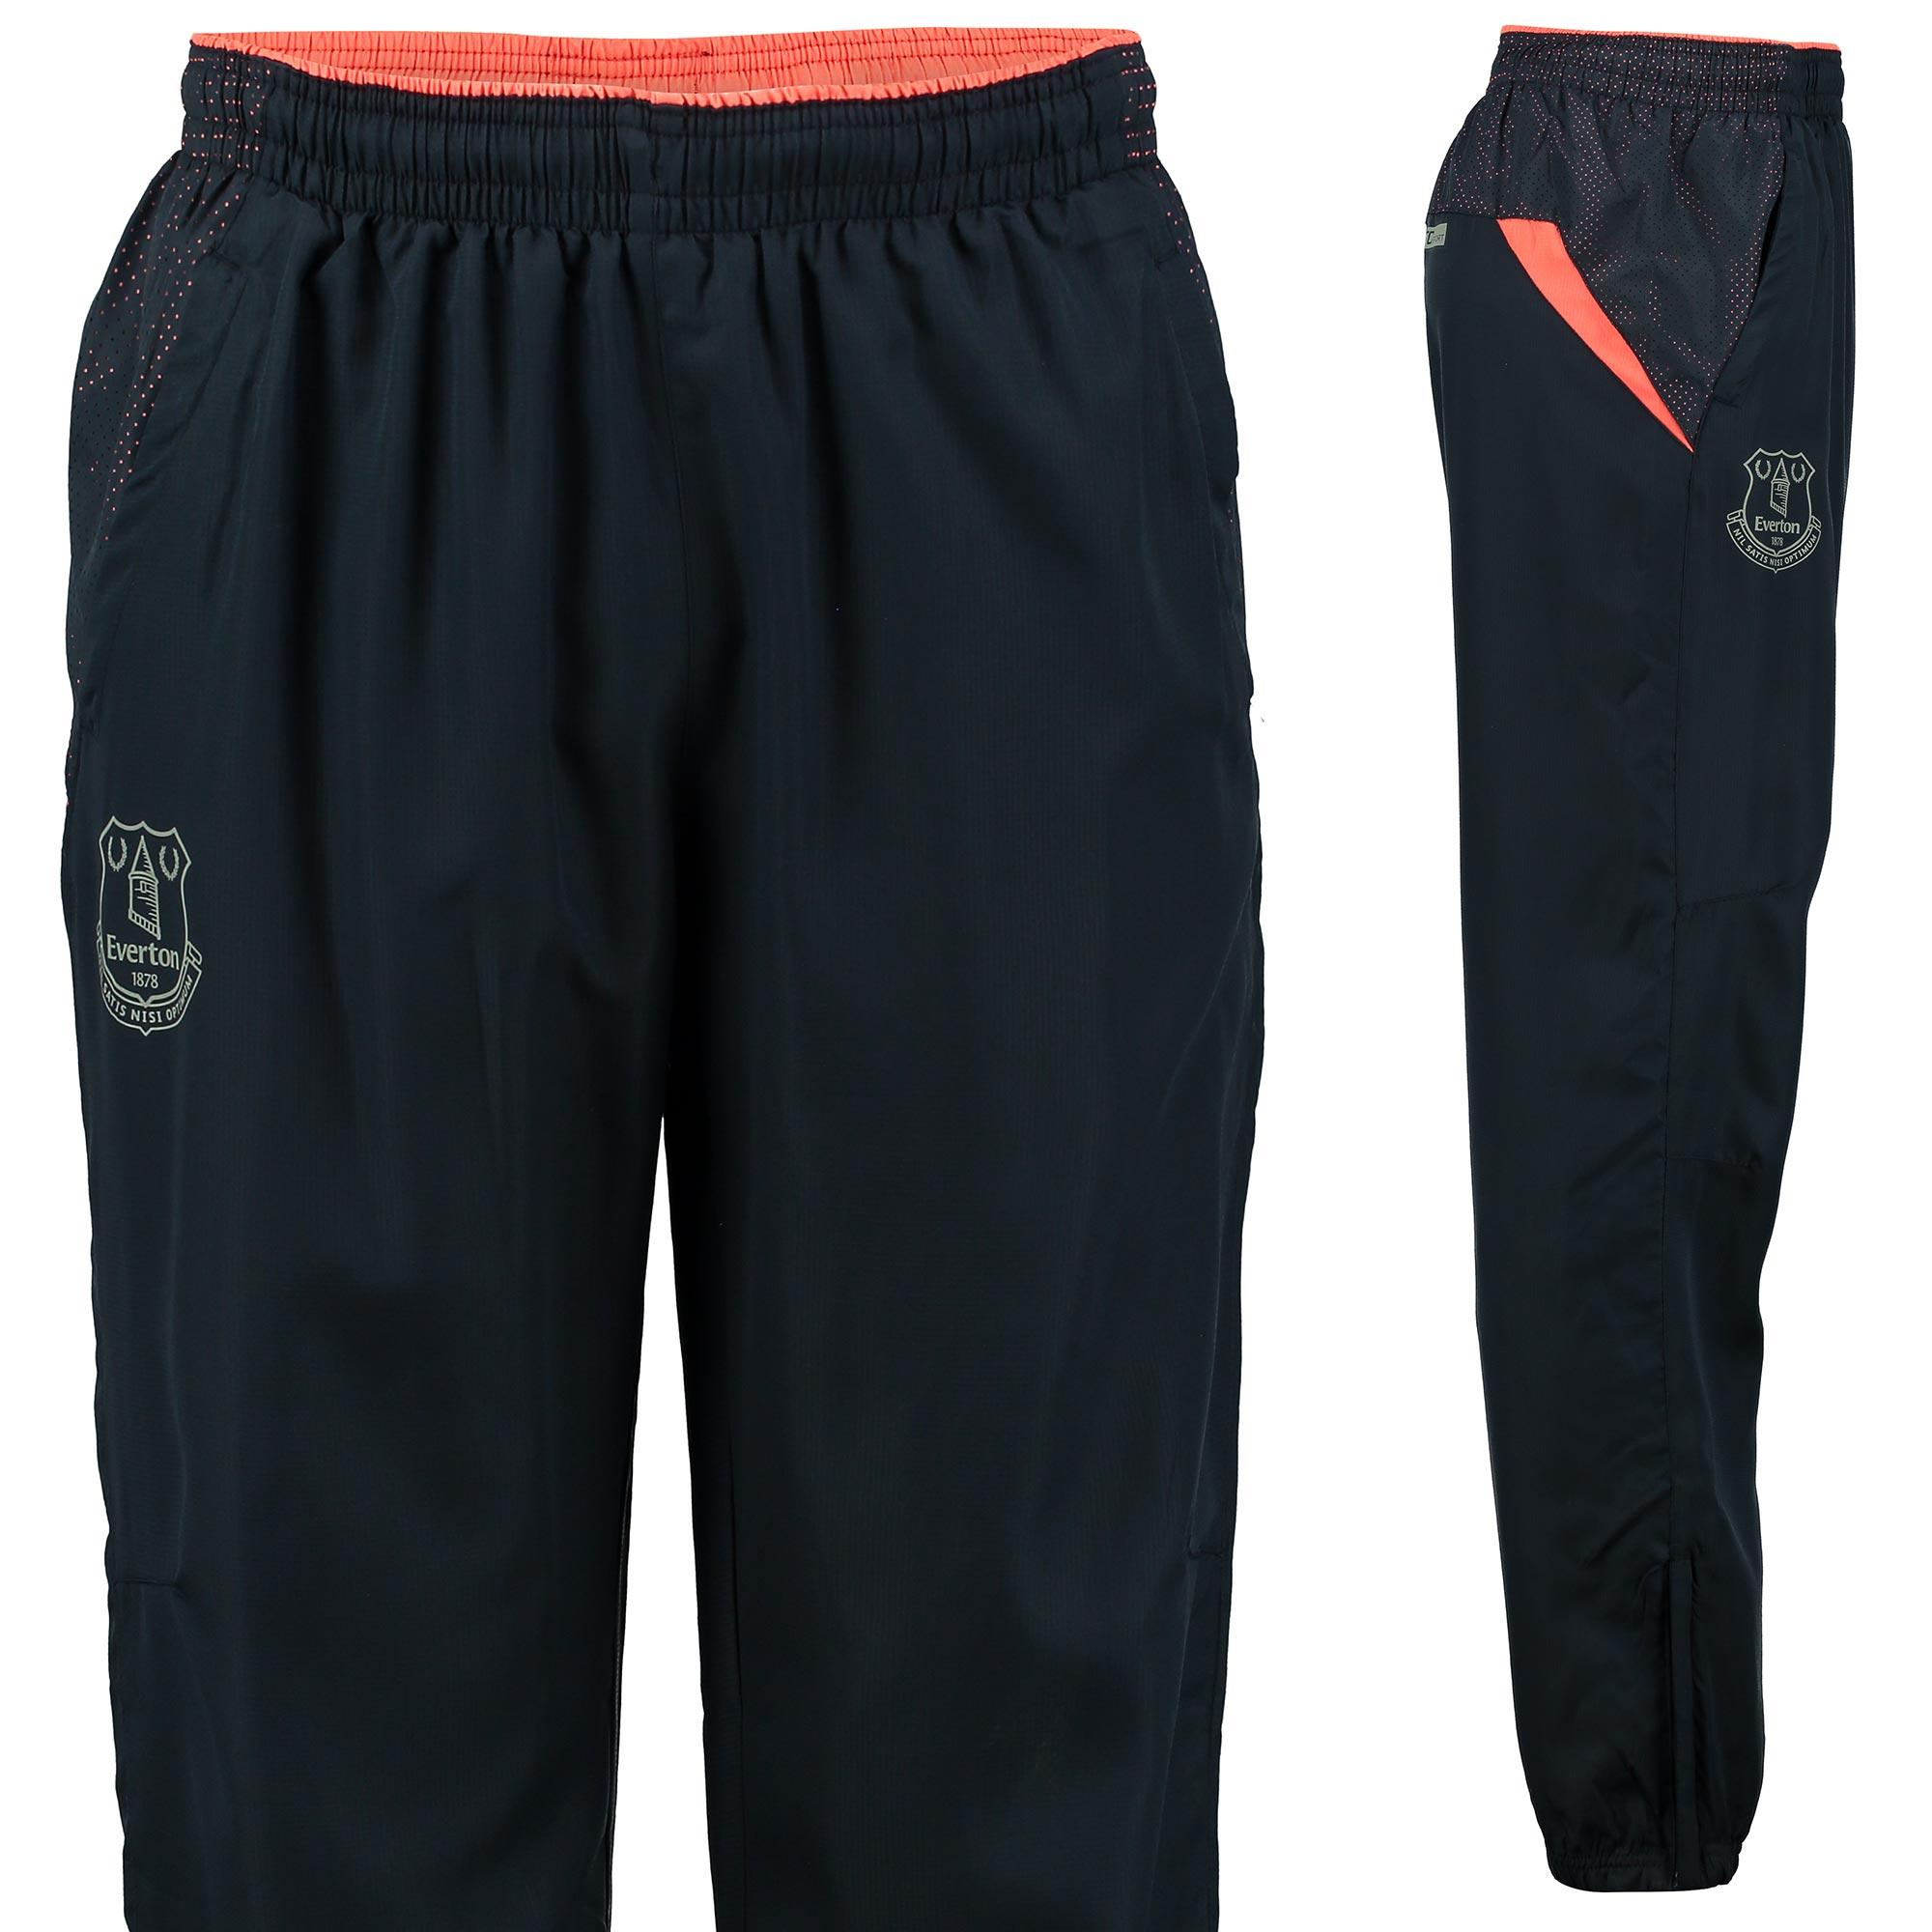 Everton Sport Woven Track Pants - Eclipse